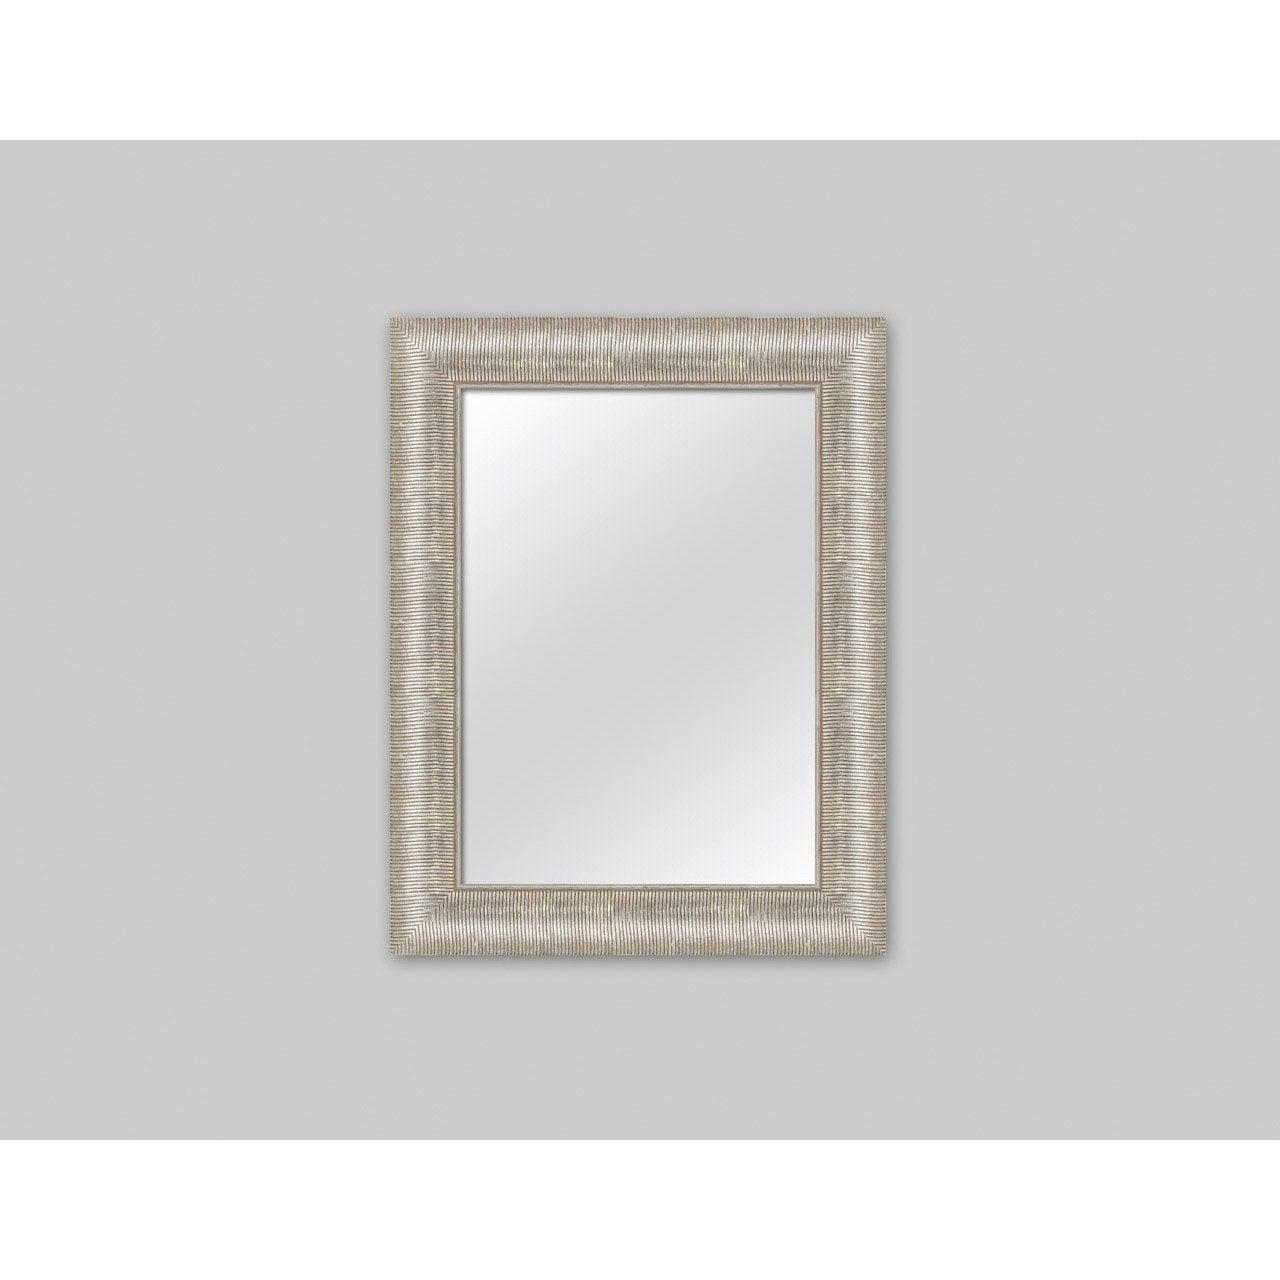 Miroir orn argent x cm leroy merlin for Miroir bois 50 x 70